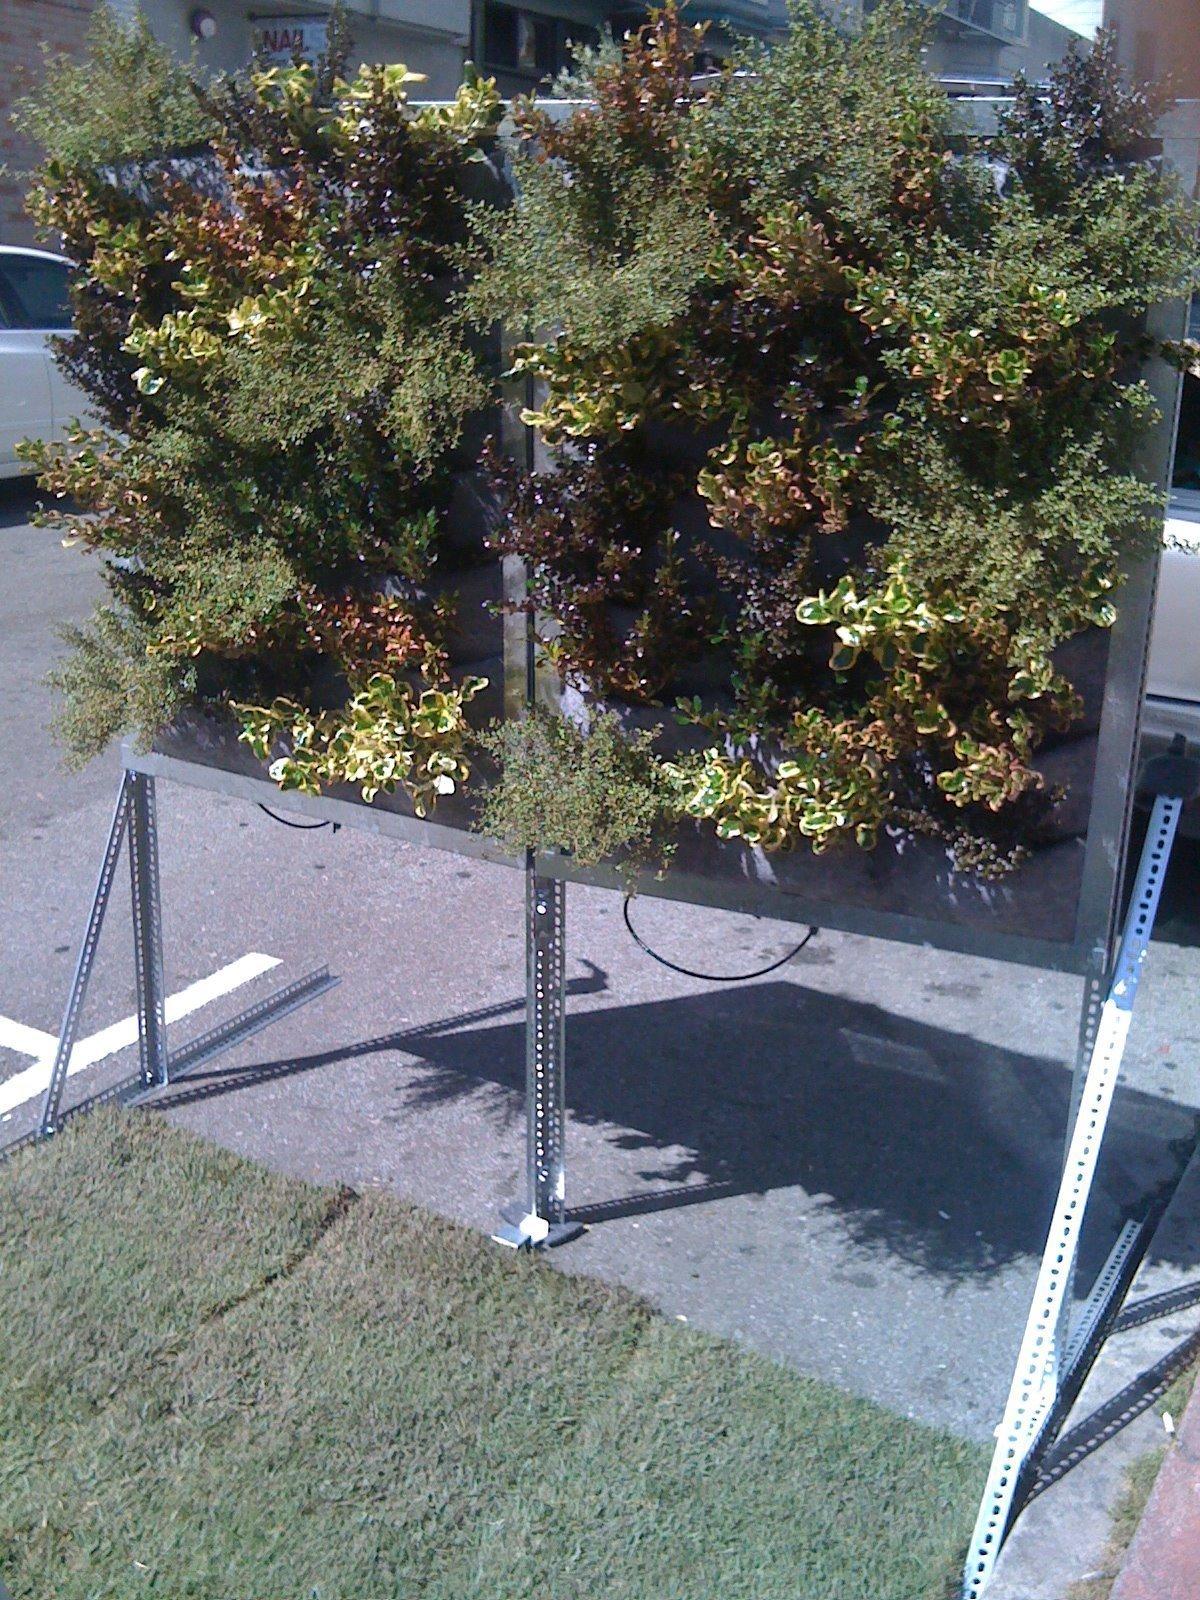 Chris-Bribach-Plants-On-Walls-Parking-Day-2